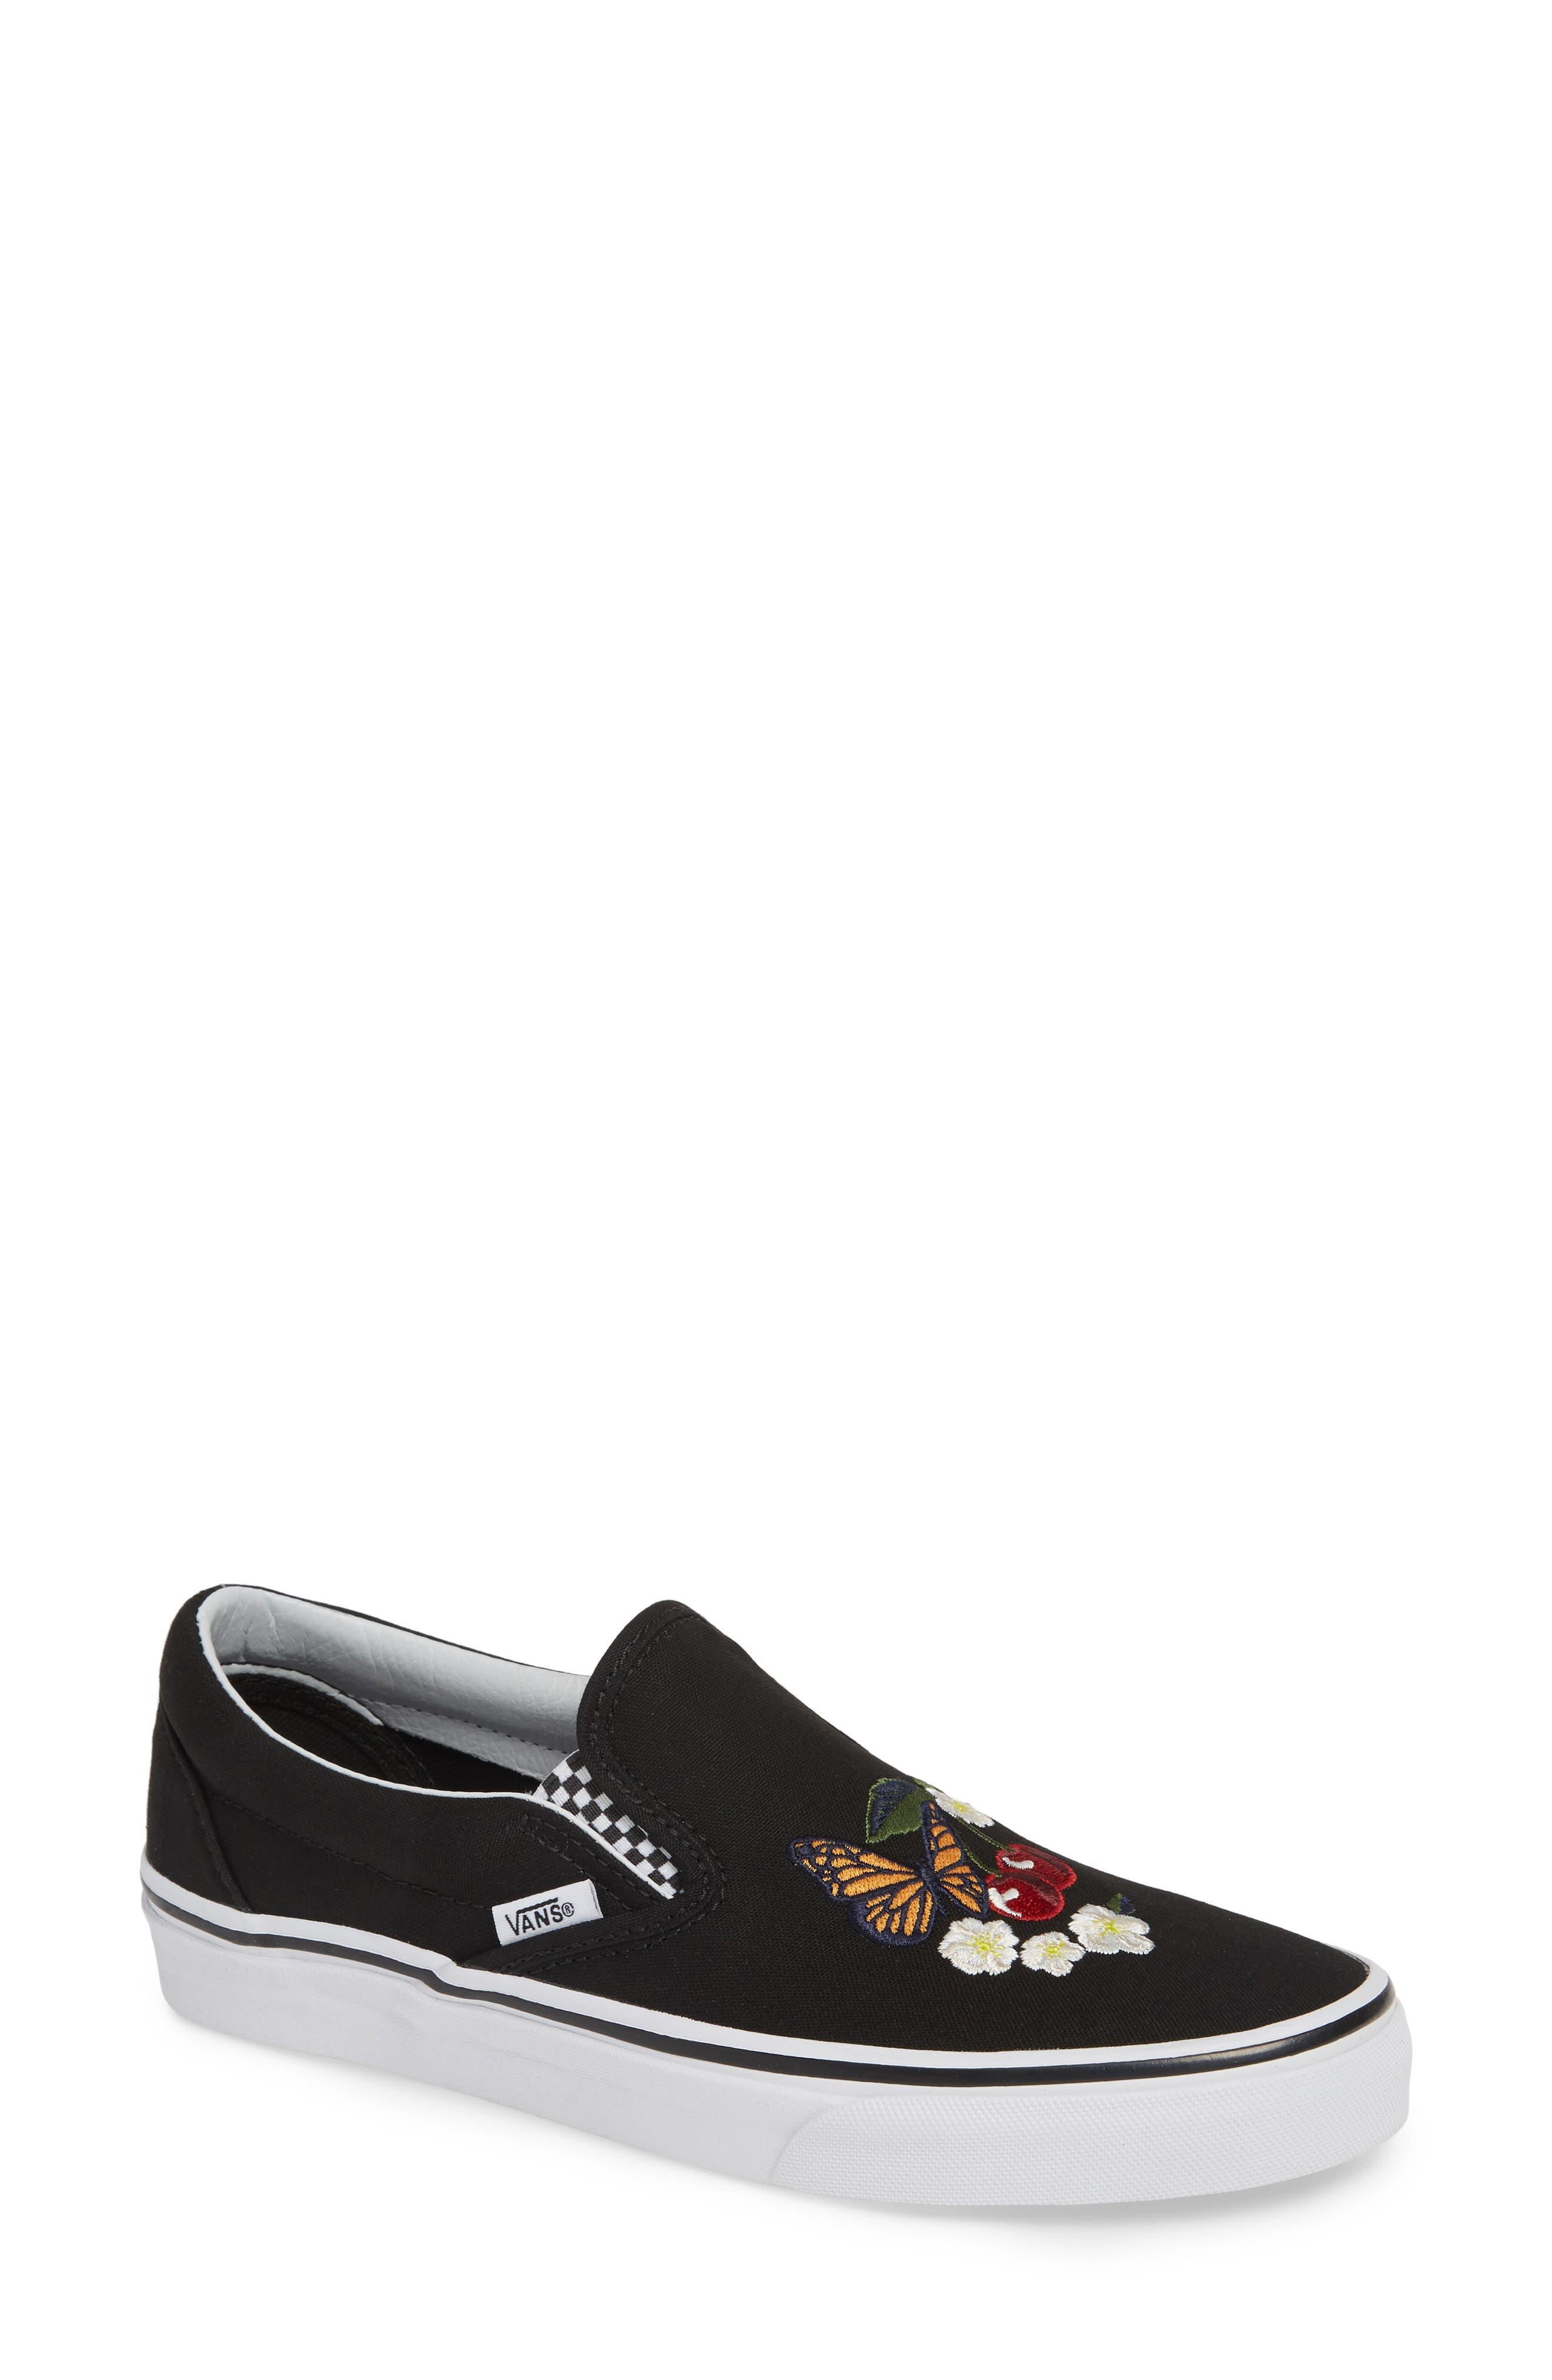 Classic Slip-On Sneaker,                             Main thumbnail 1, color,                             CHECKER FLORAL BLACK